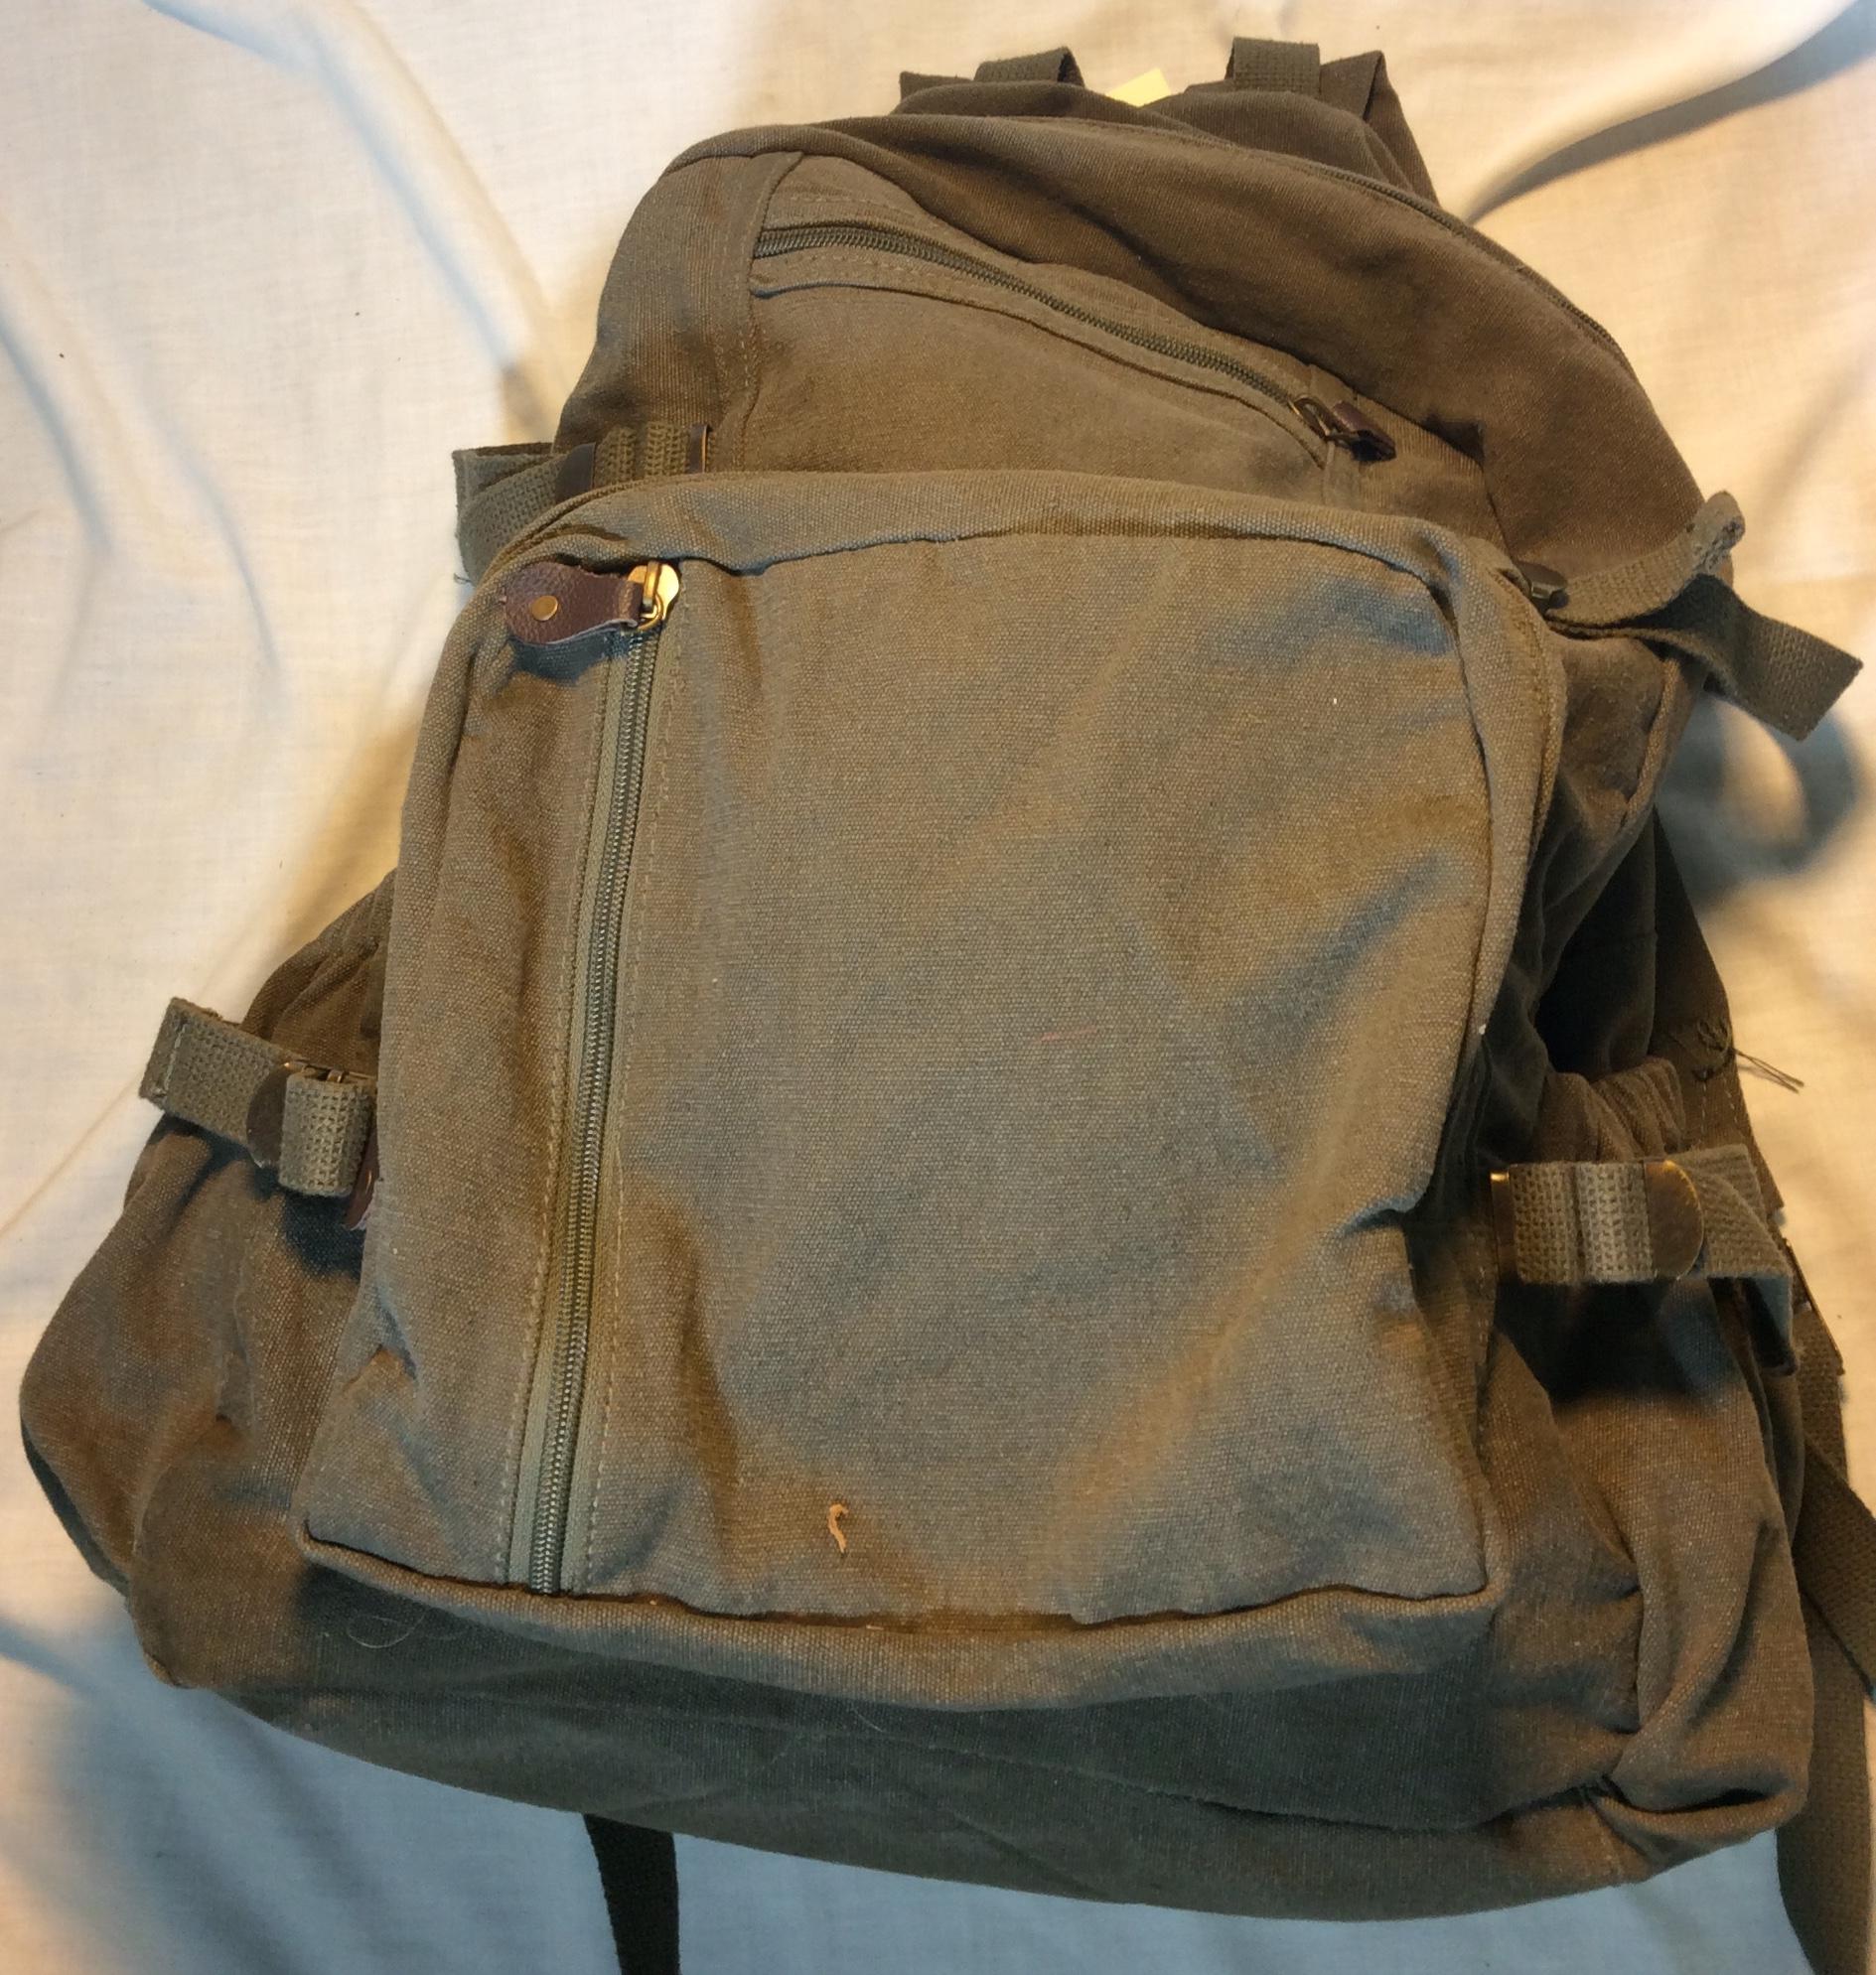 Olive Green Cloth Backpack